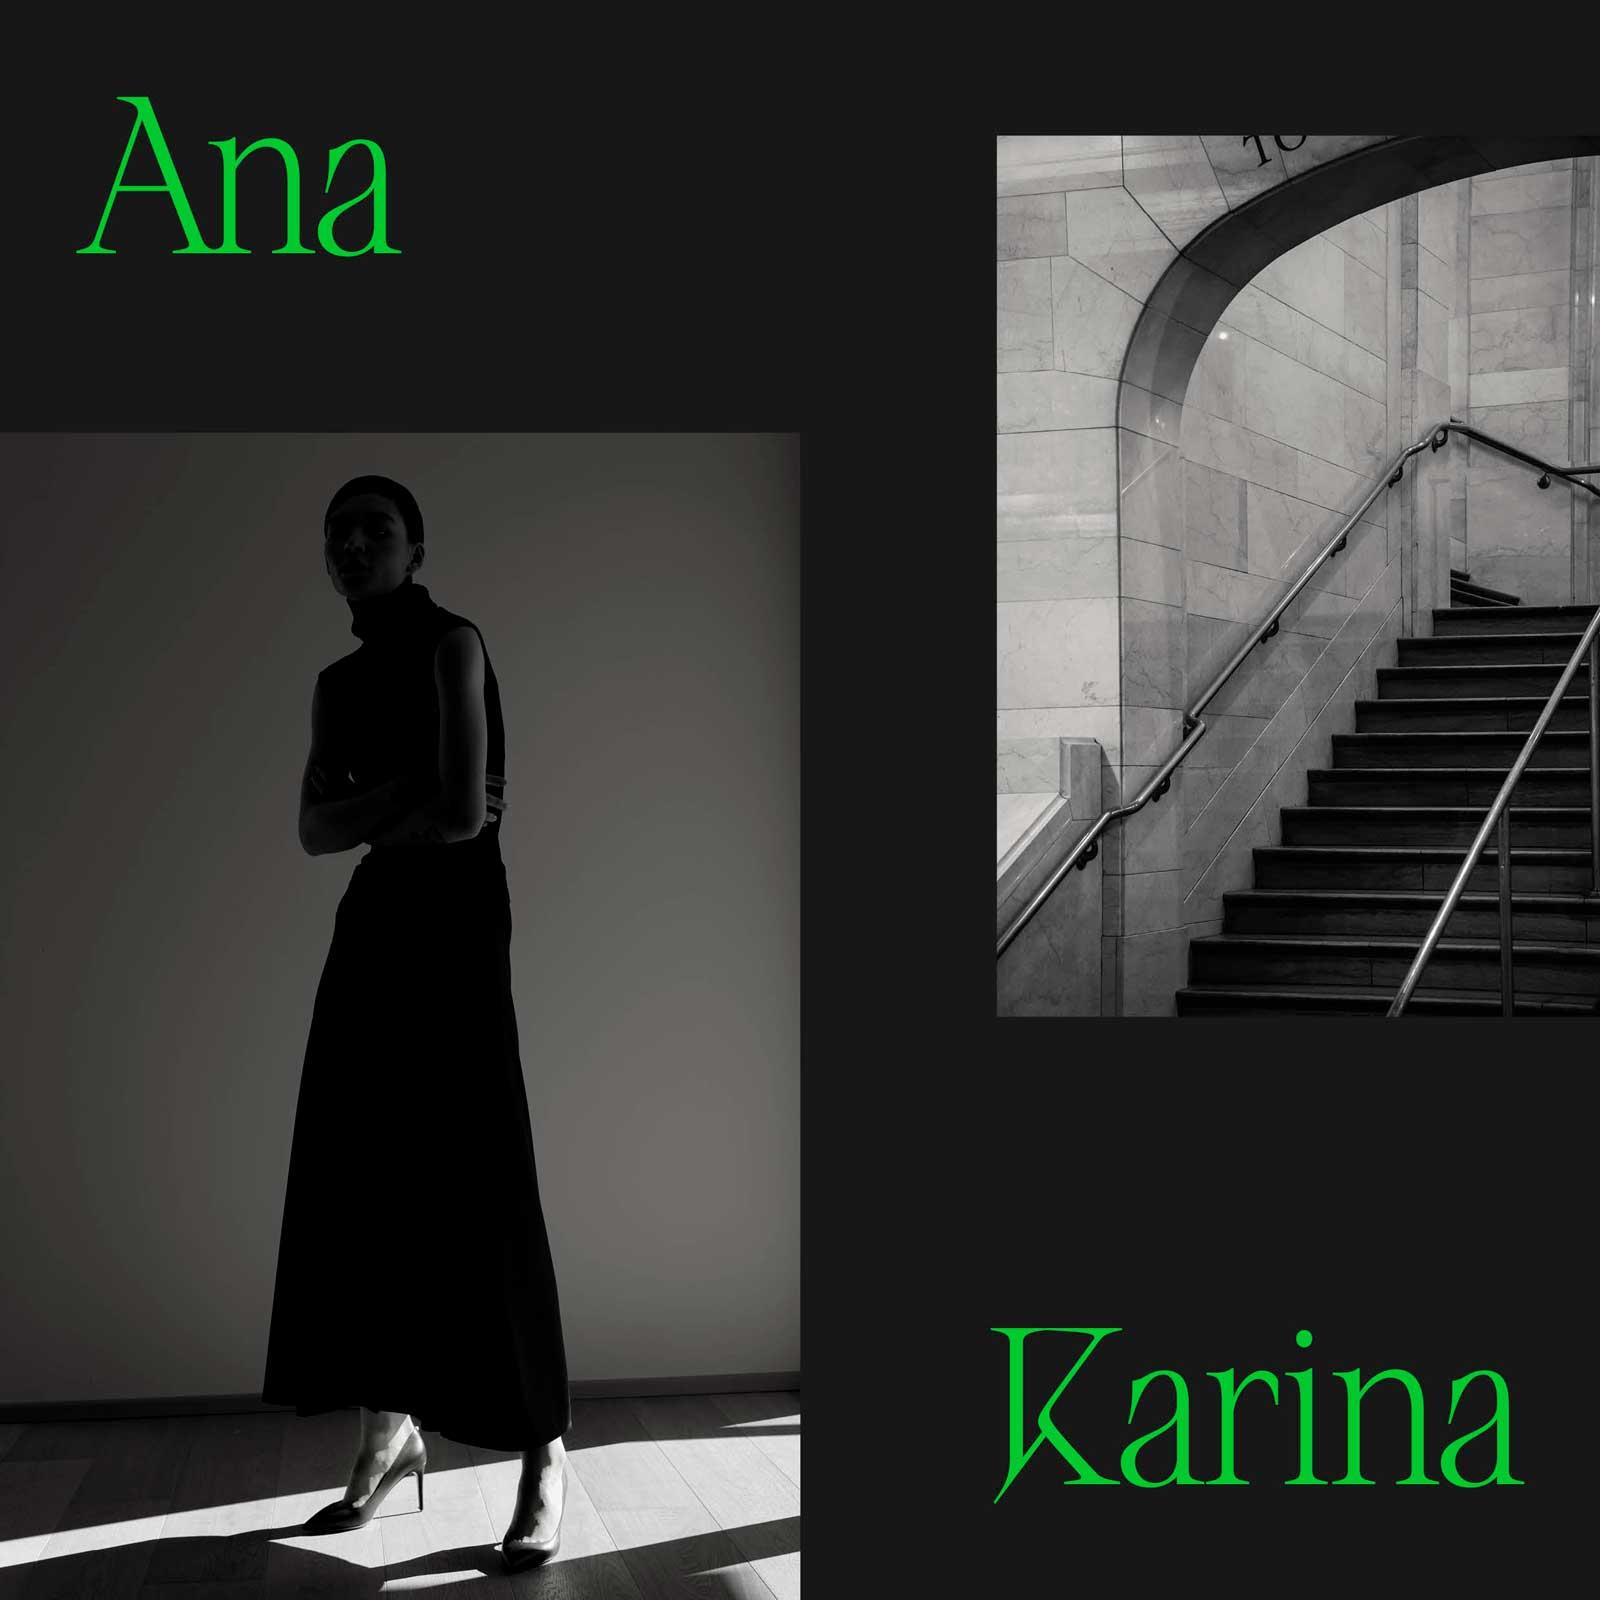 Ana Karina Sustainable Fashion Brand Kit – Instagram Feed Design / Template